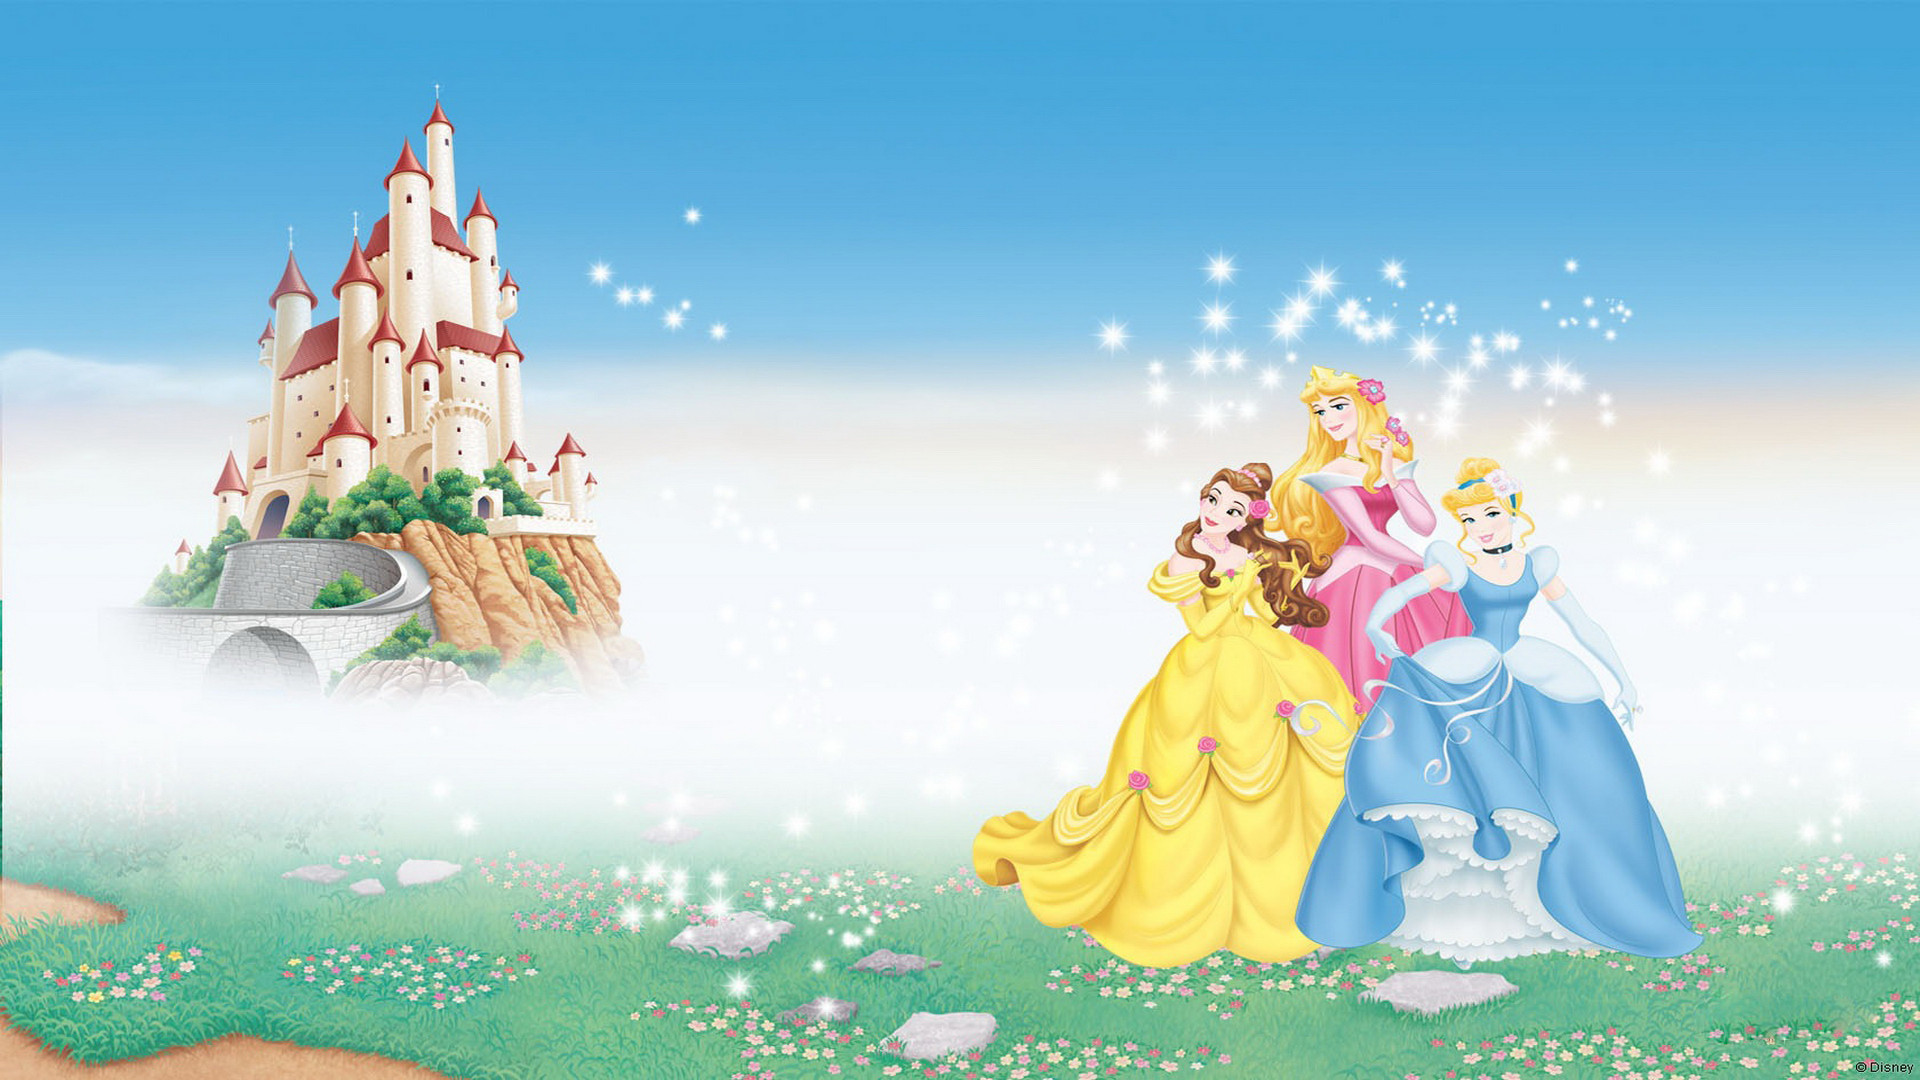 Princess Disney Wallpaper Wallpapertag